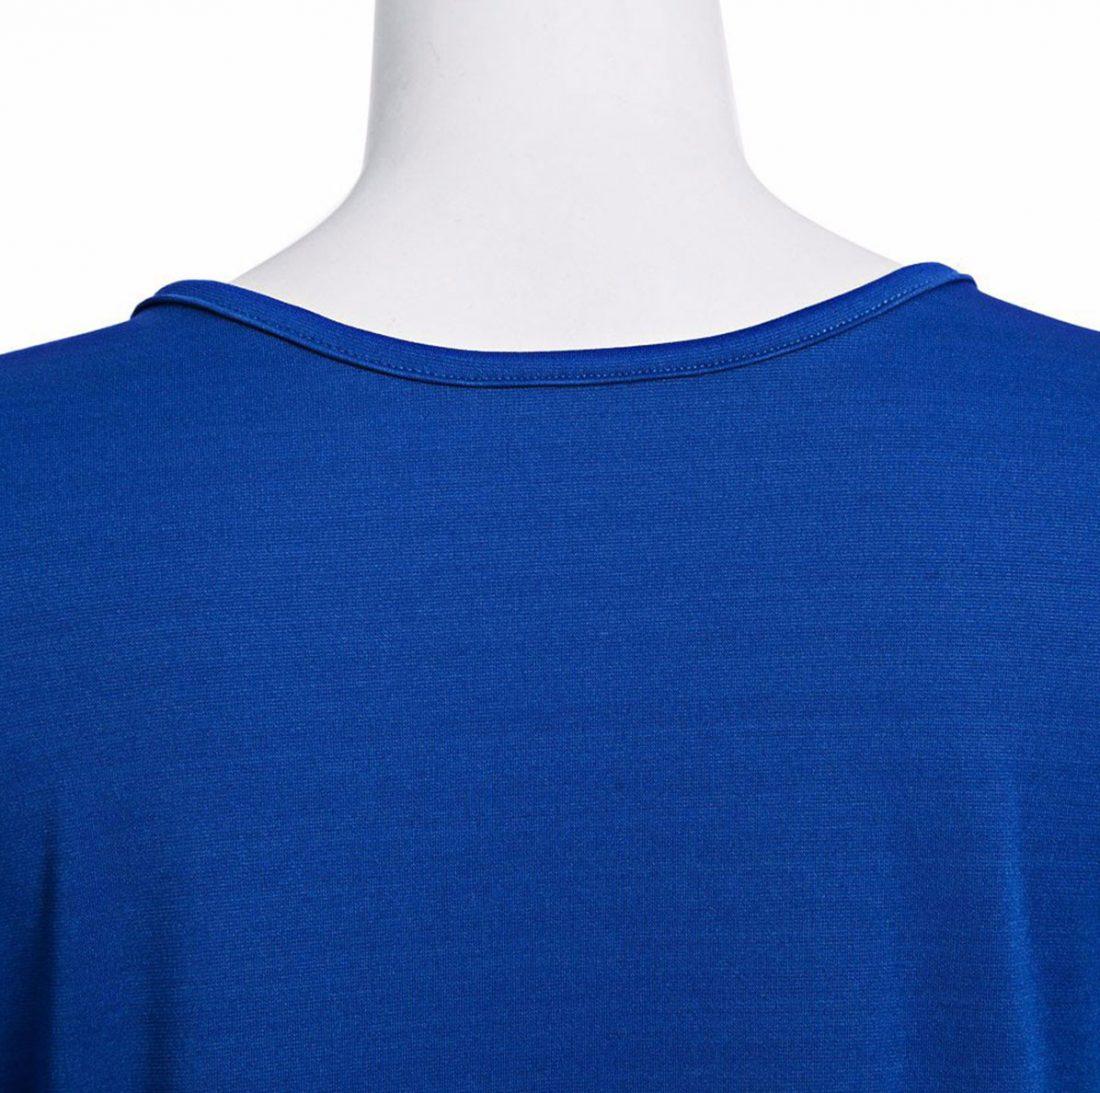 M0185 blue13 Office Evening Dresses maureens.com boutique